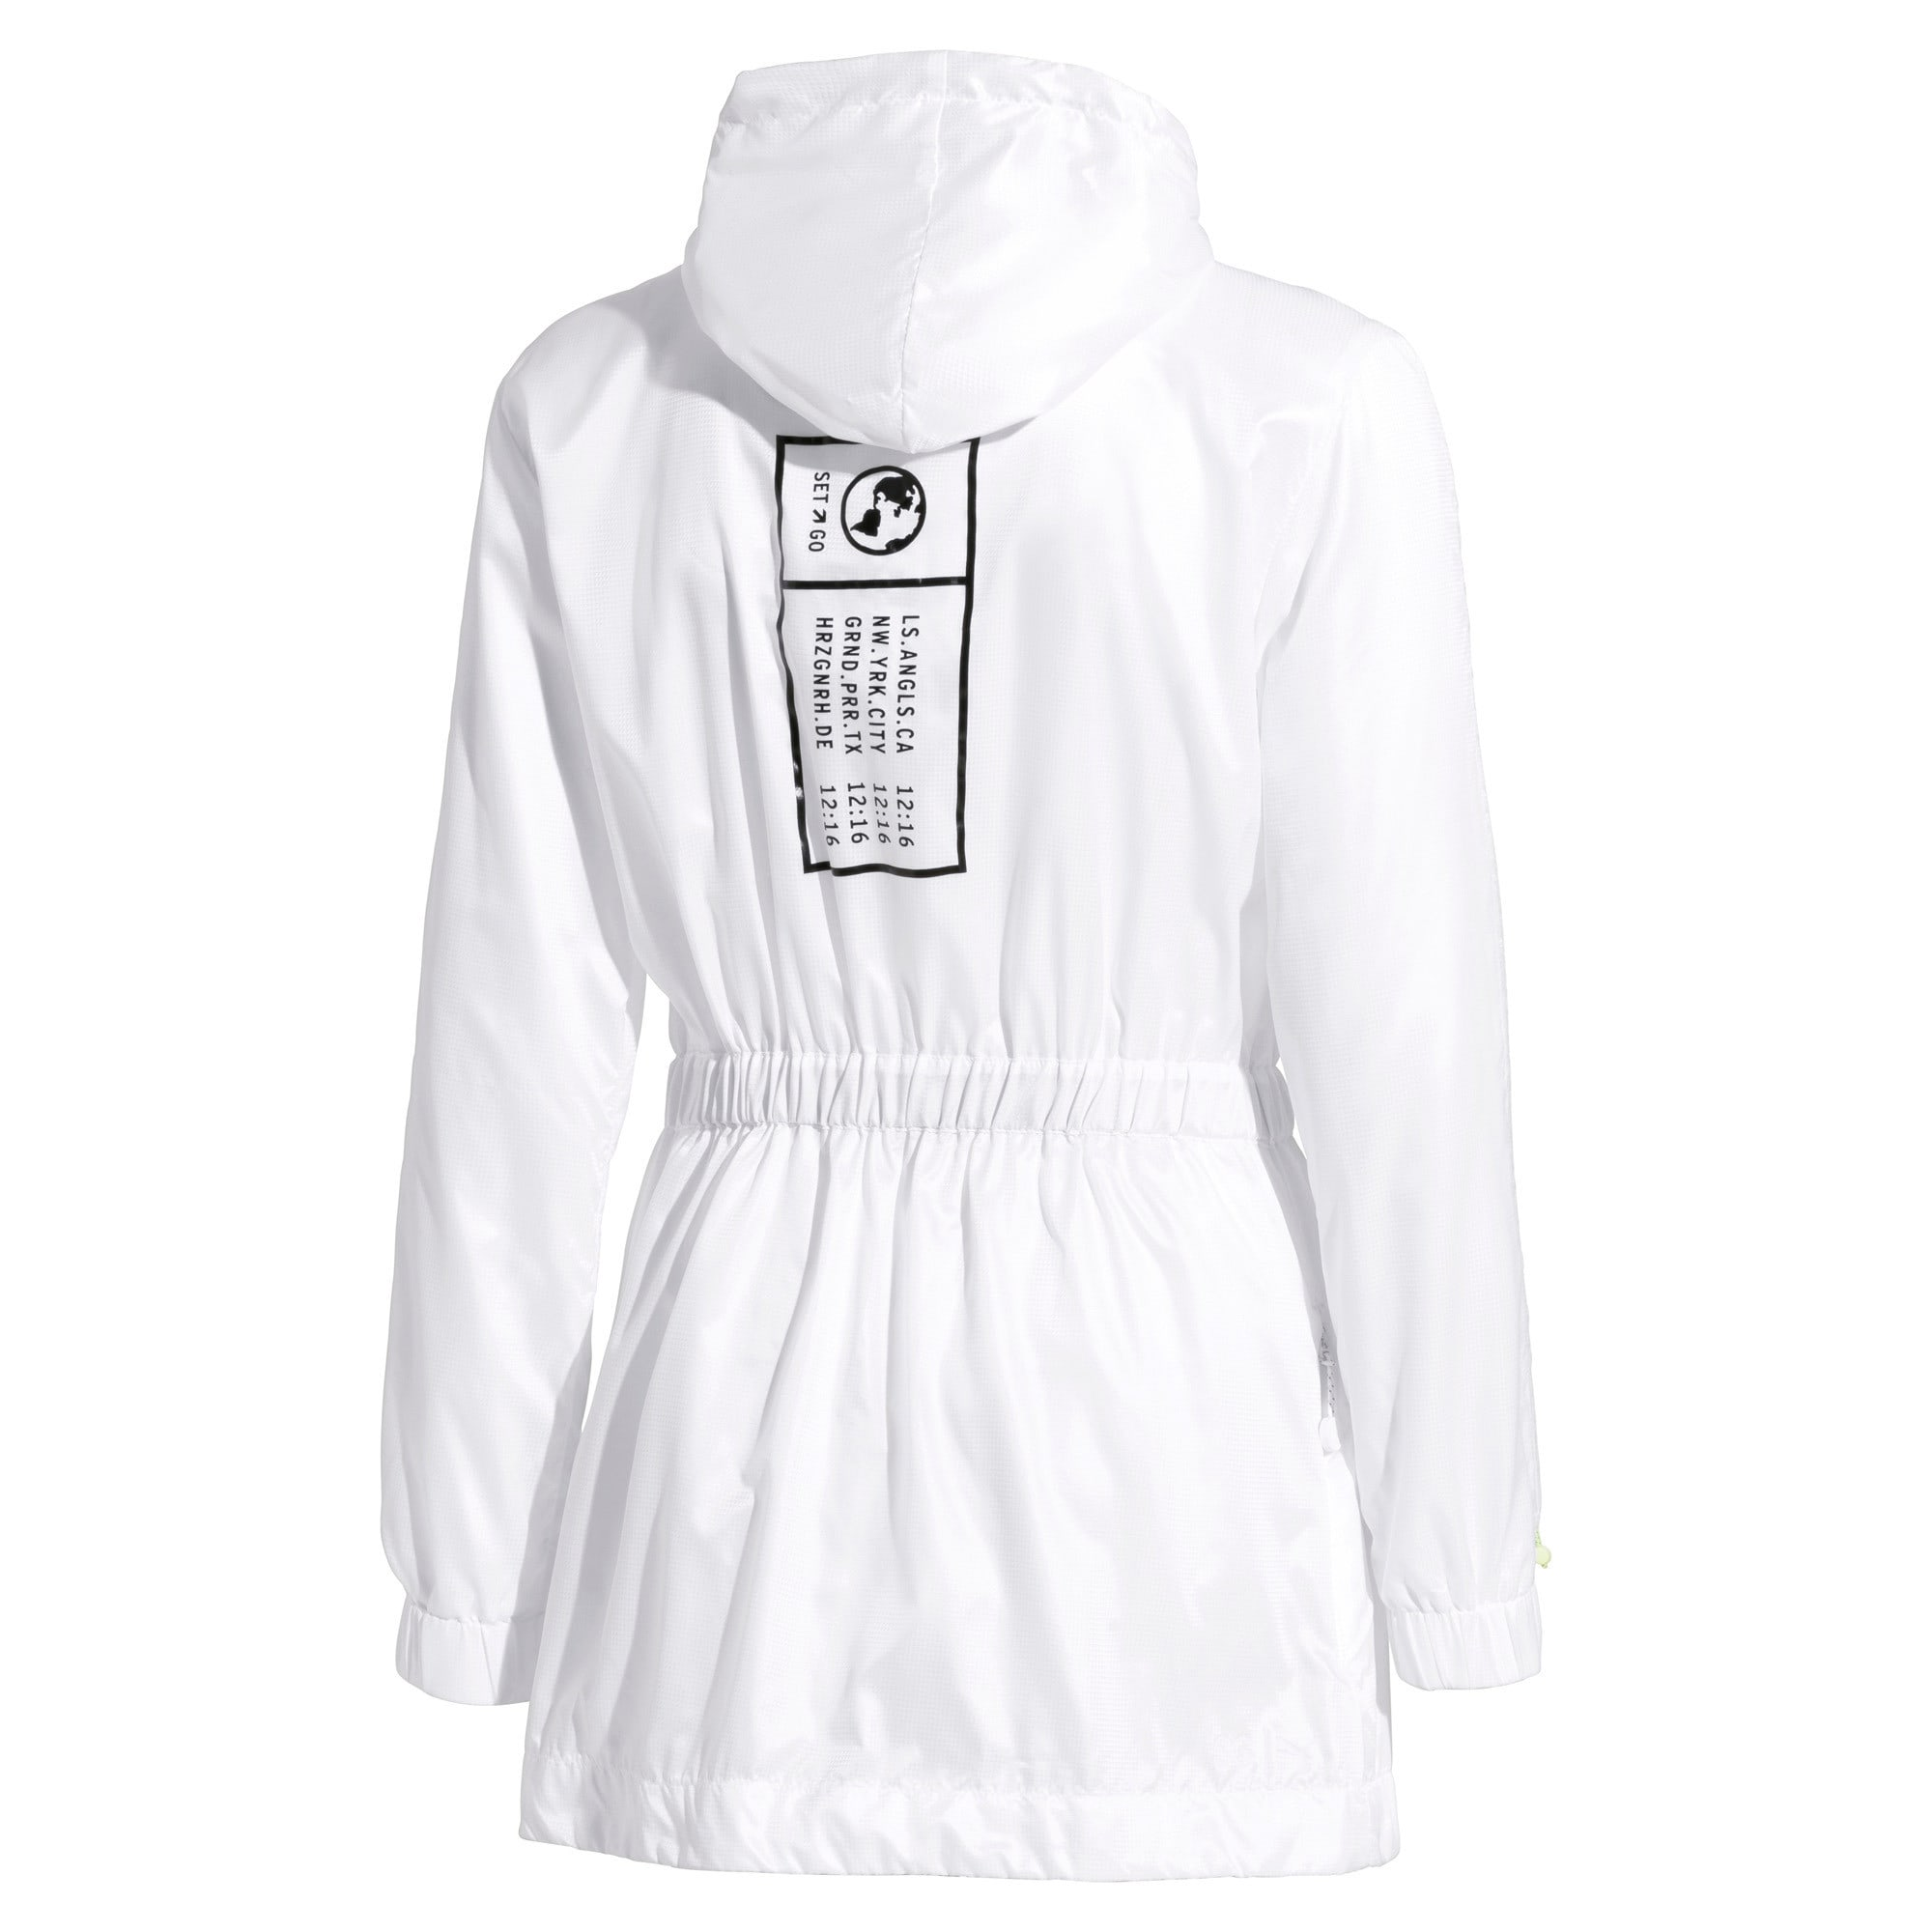 Thumbnail 5 of PUMA x SELENA GOMEZ Hooded Women's Jacket, Puma White, medium